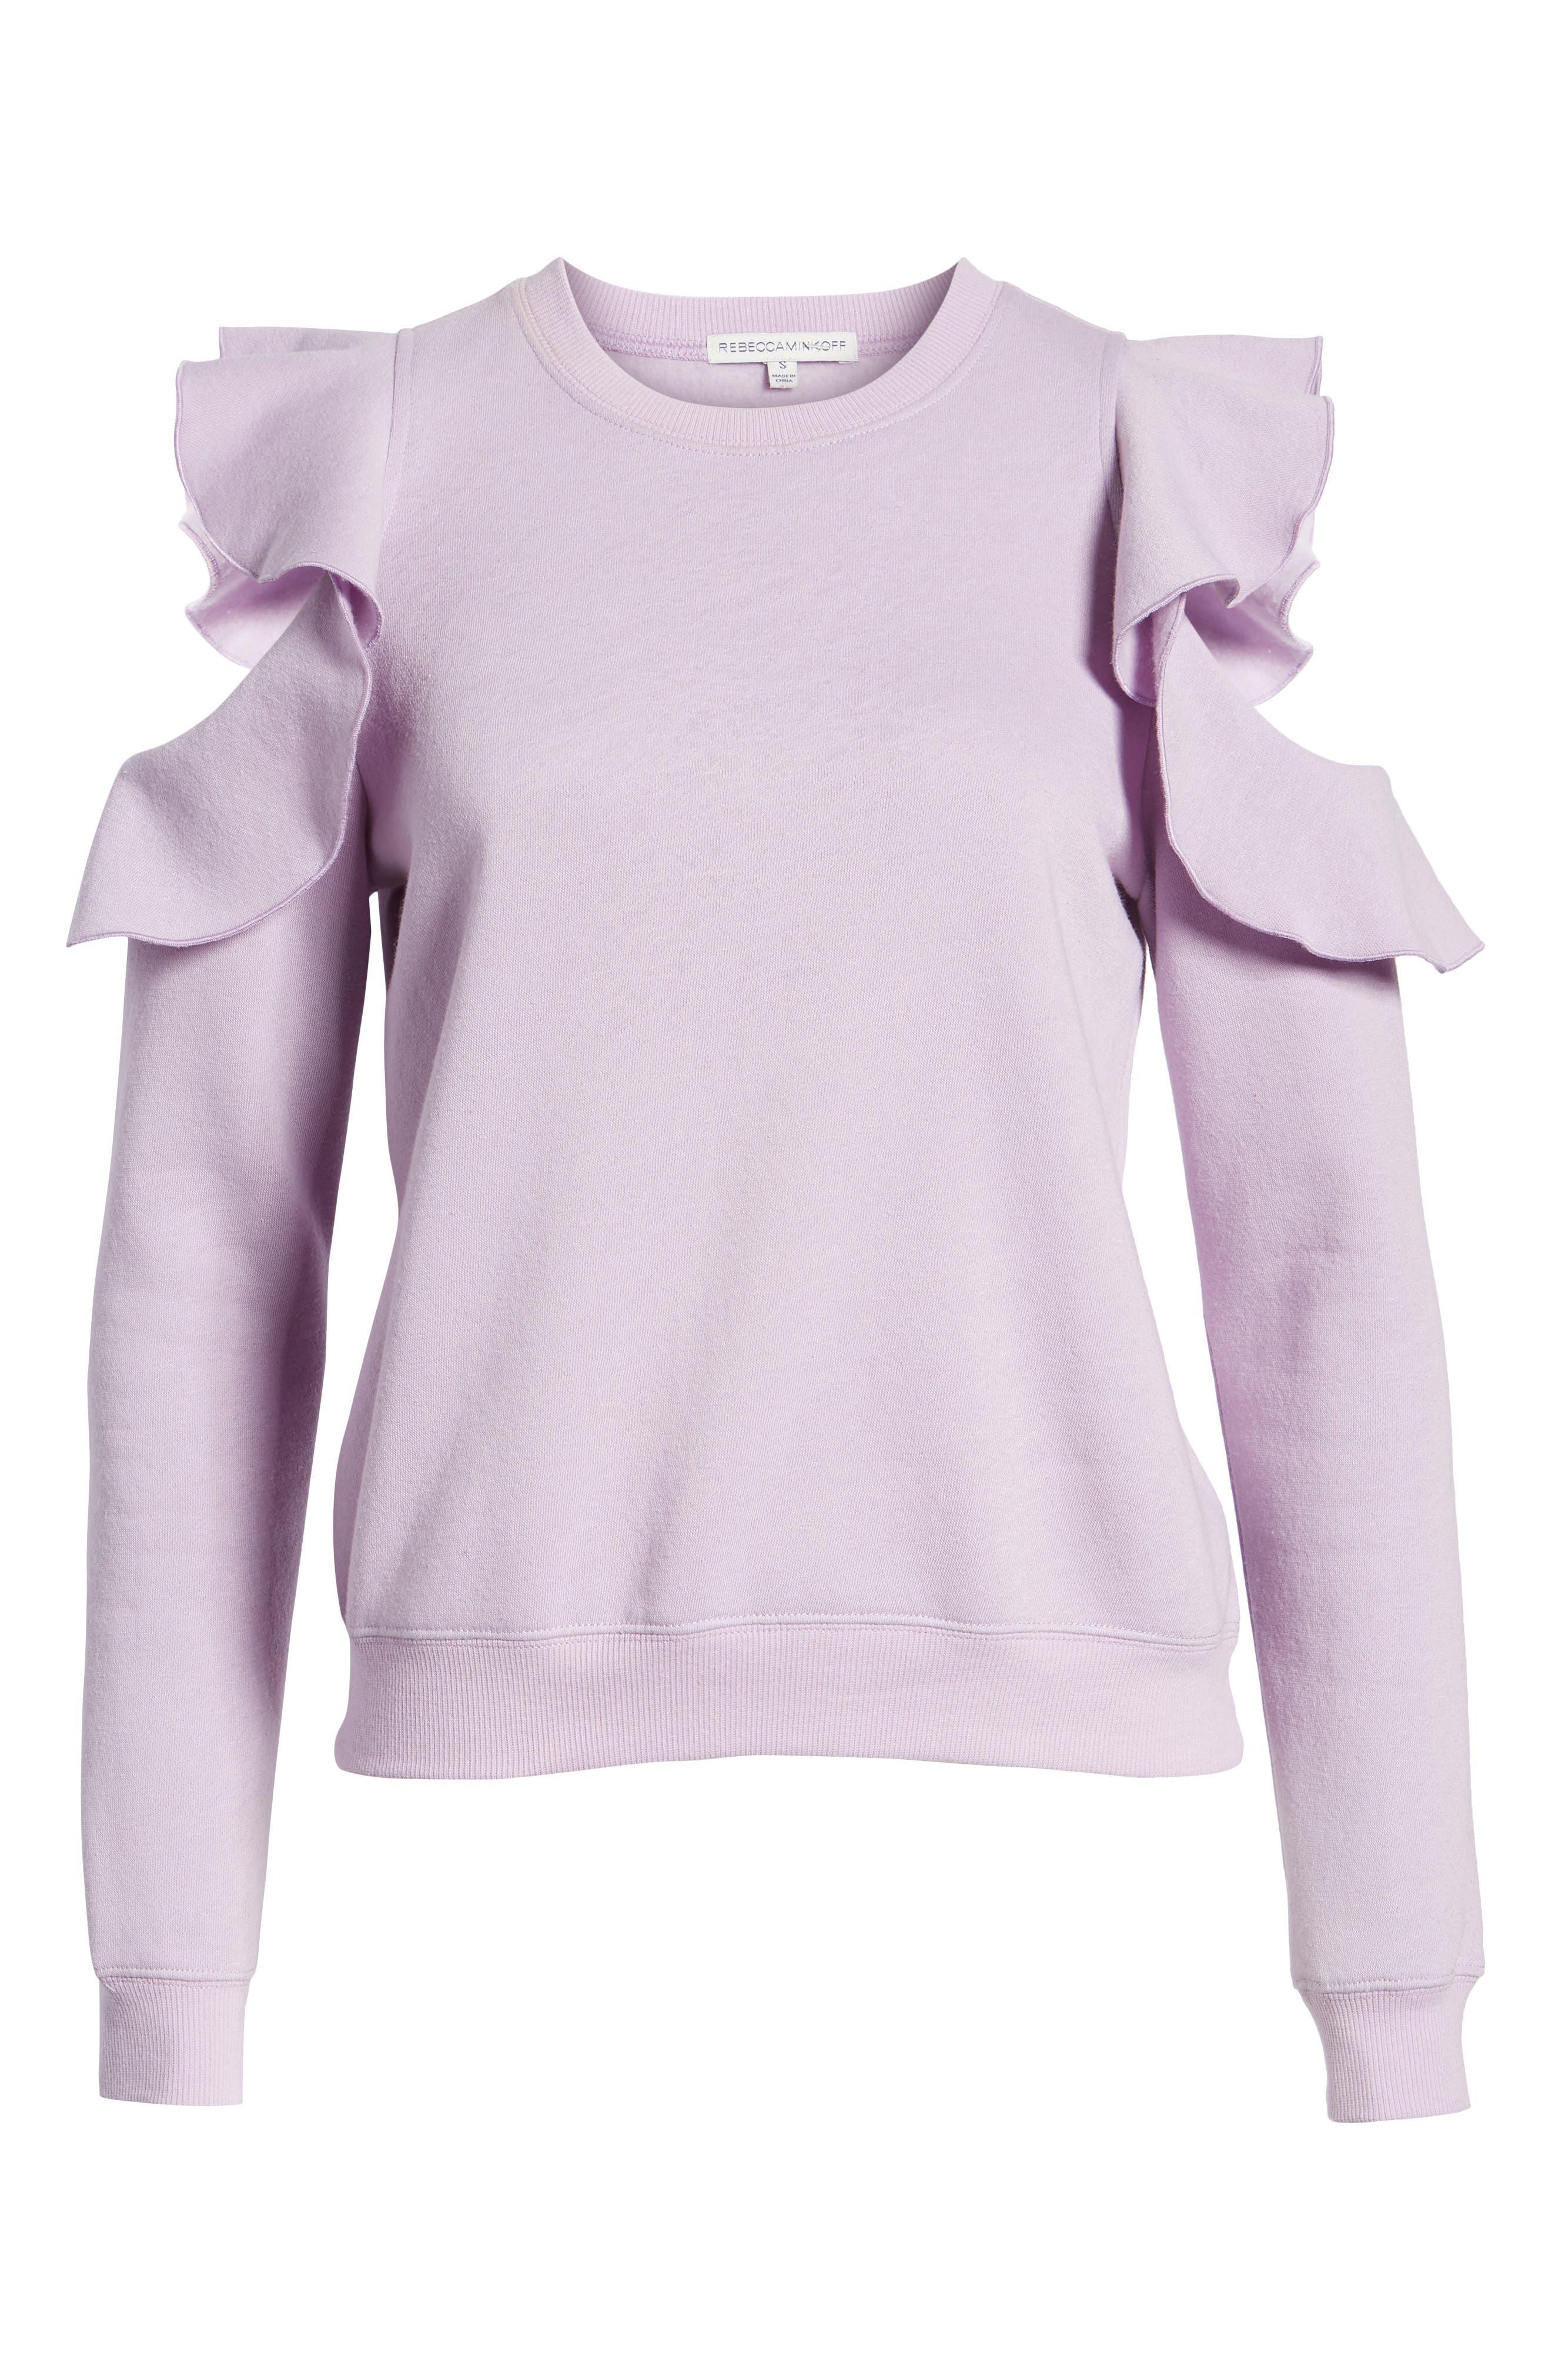 REBECCA MINKOFF, Gracie Cold Shoulder Sweatshirt, Alternate thumbnail 7, color, 502